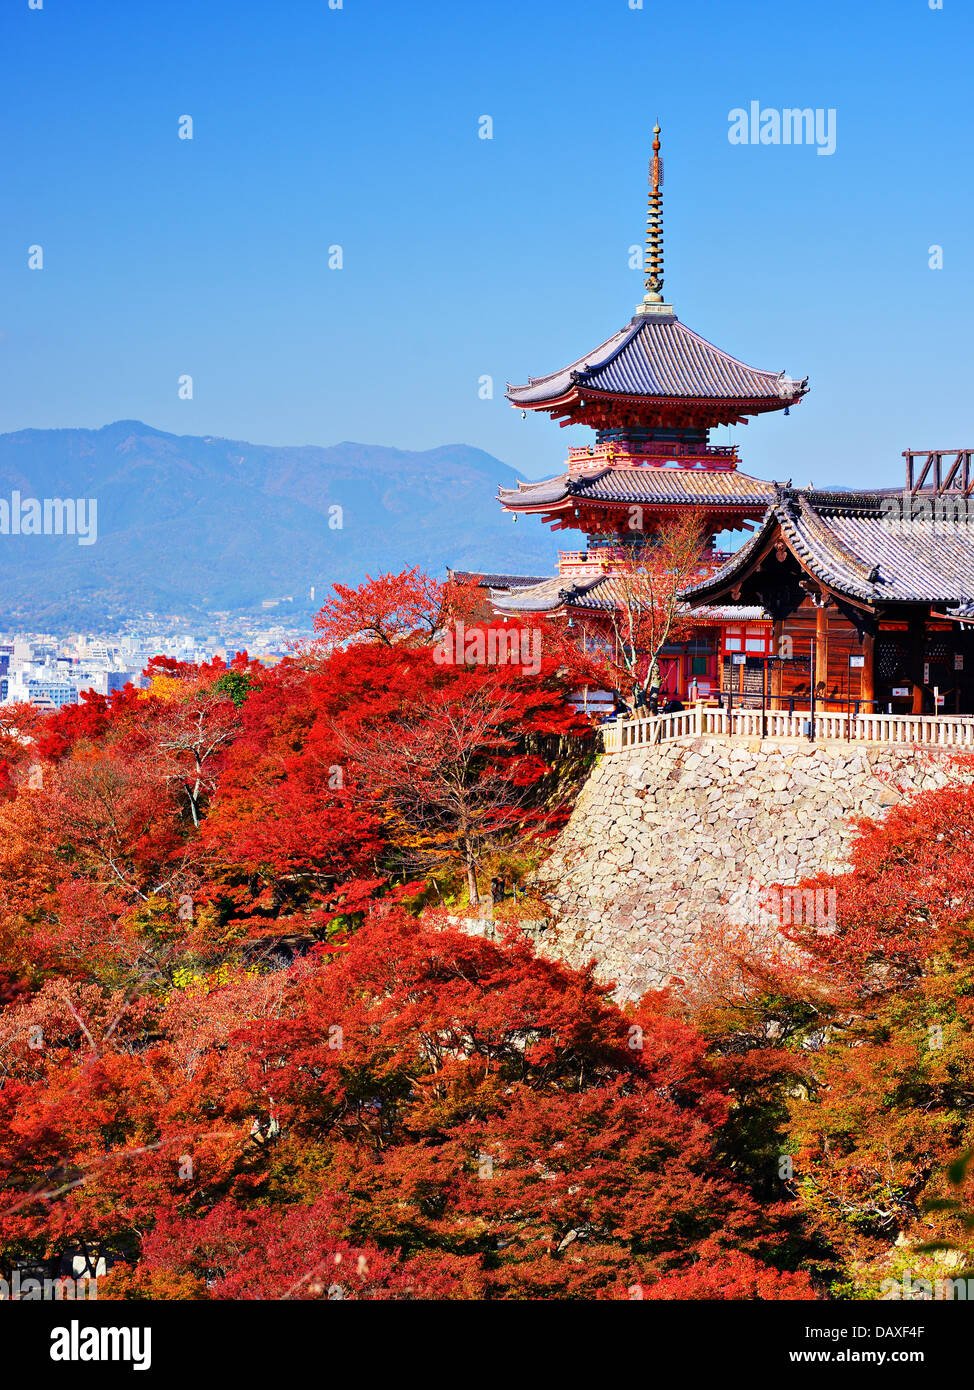 Kiyomizu-Dera Pagode mit Herbstfarben in Kyoto, Japan. Stockbild